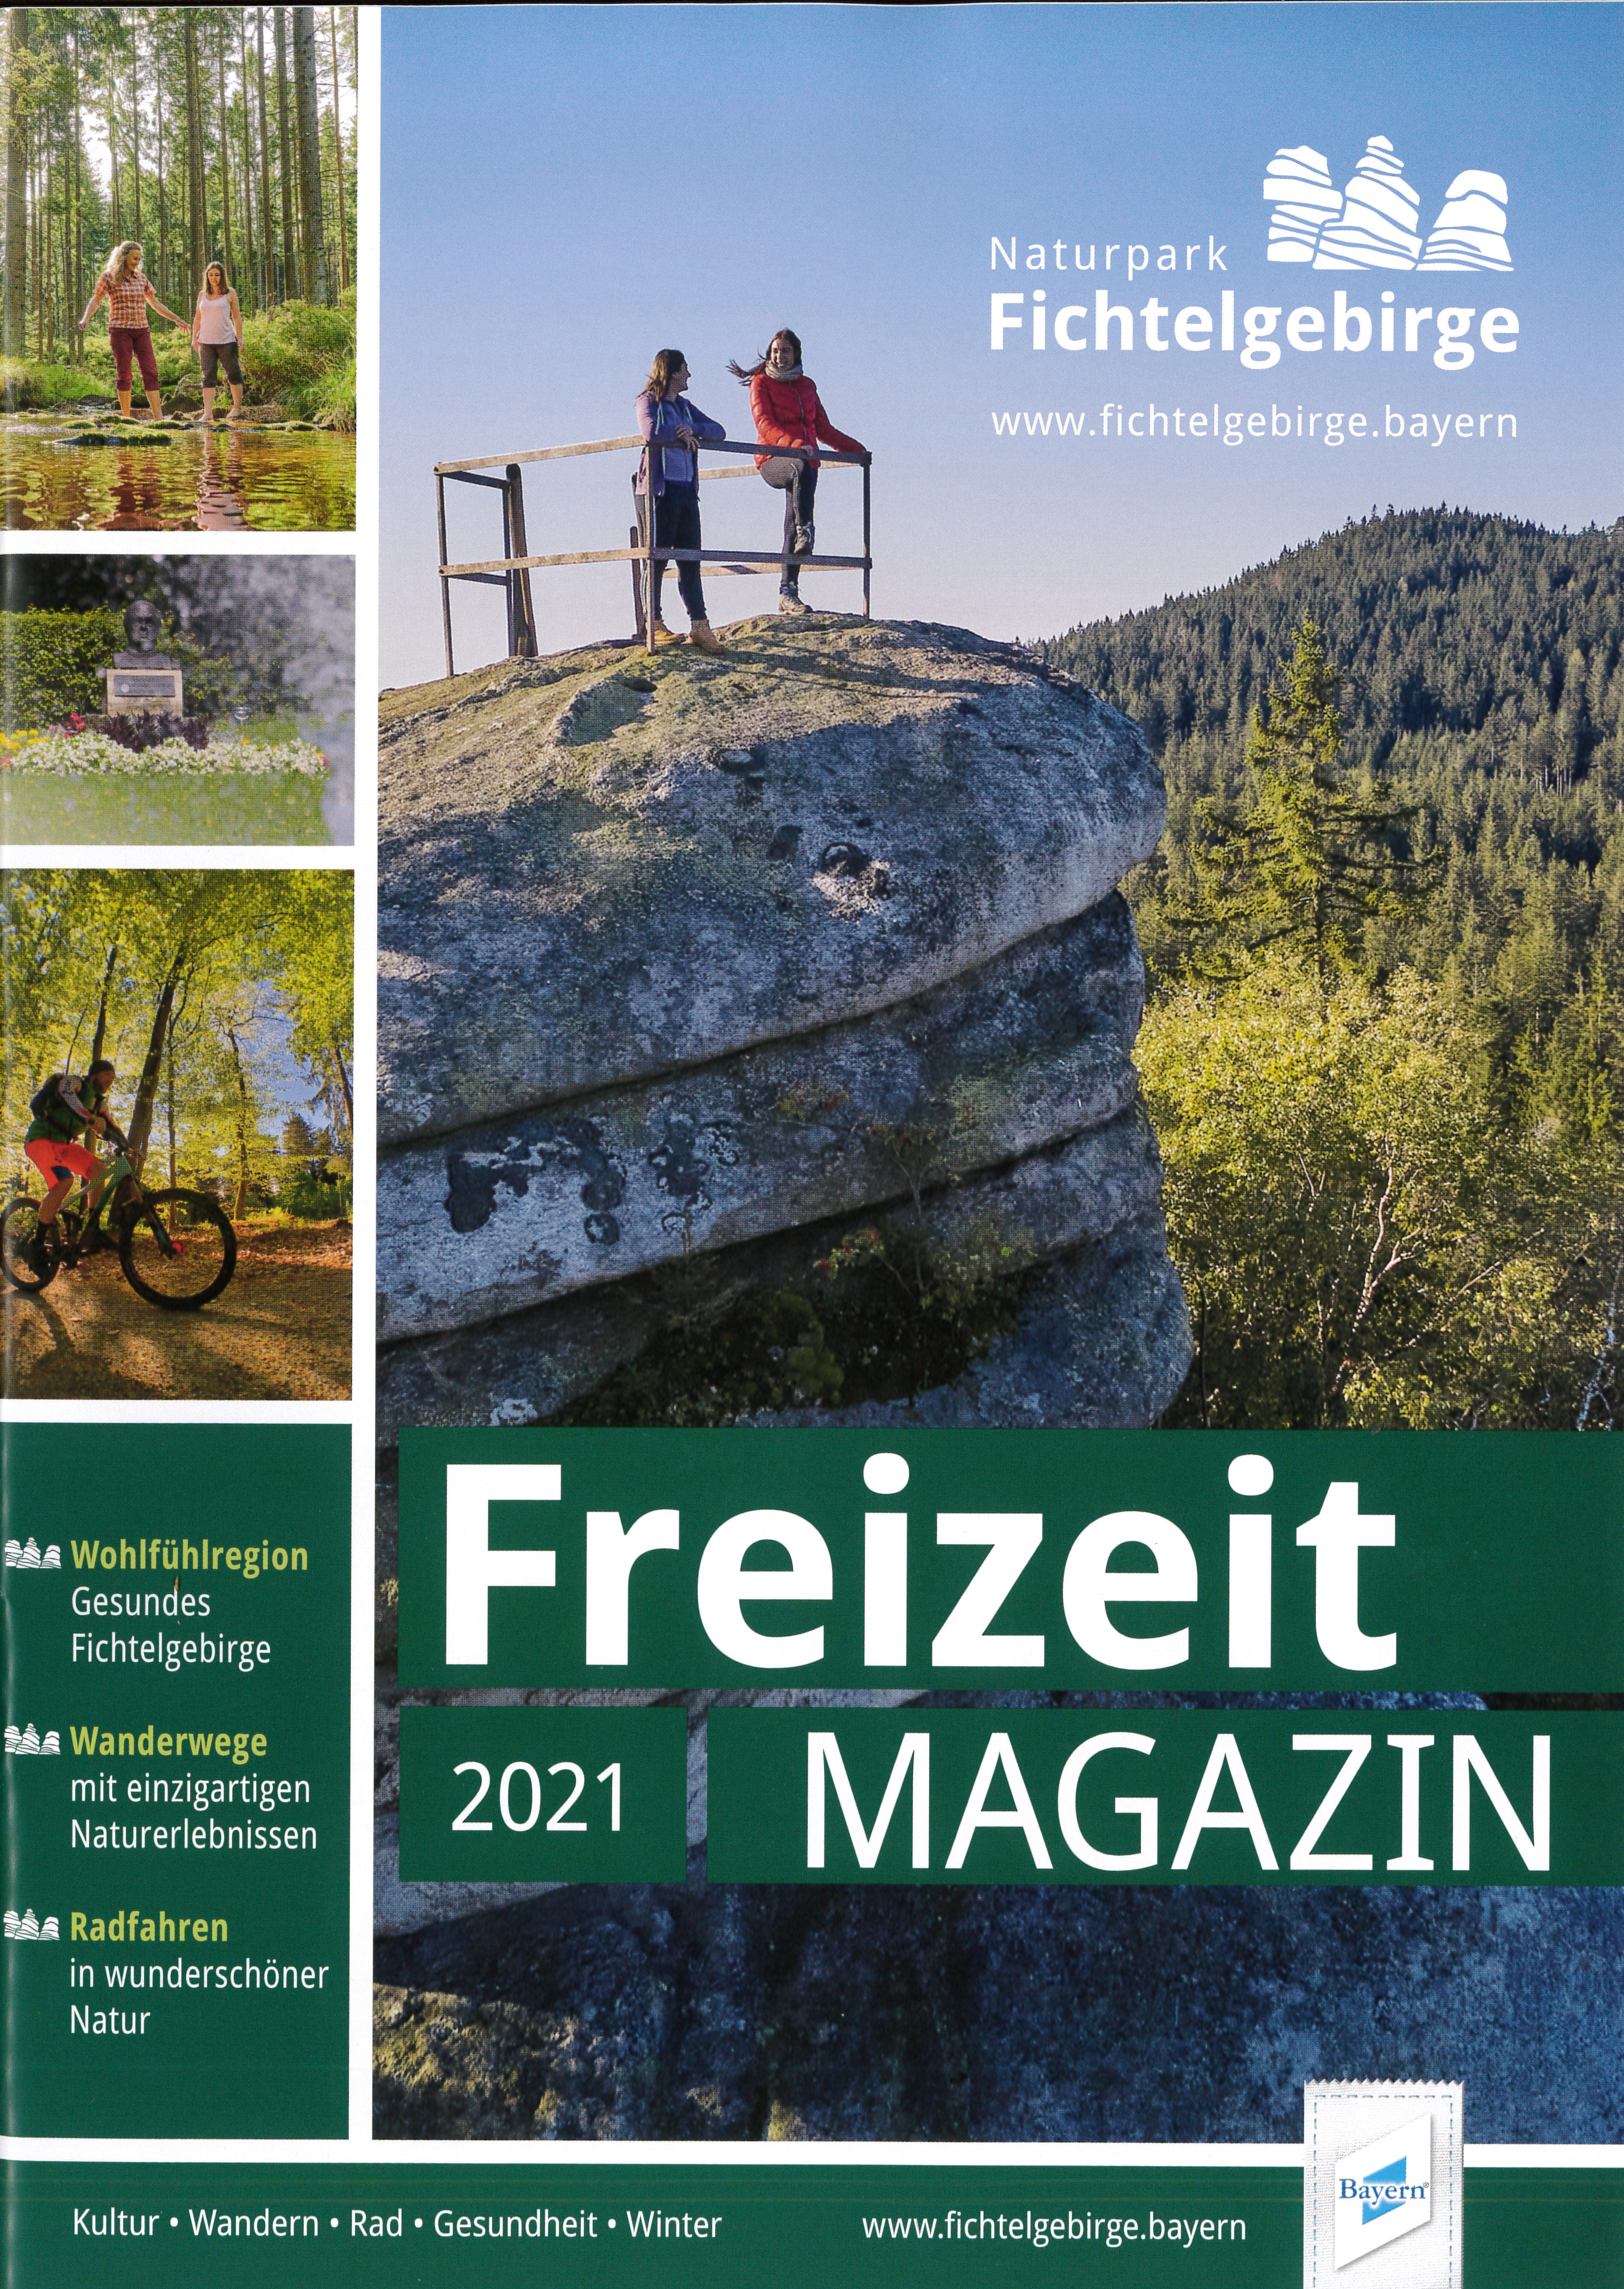 Freizeitmagazin 2021